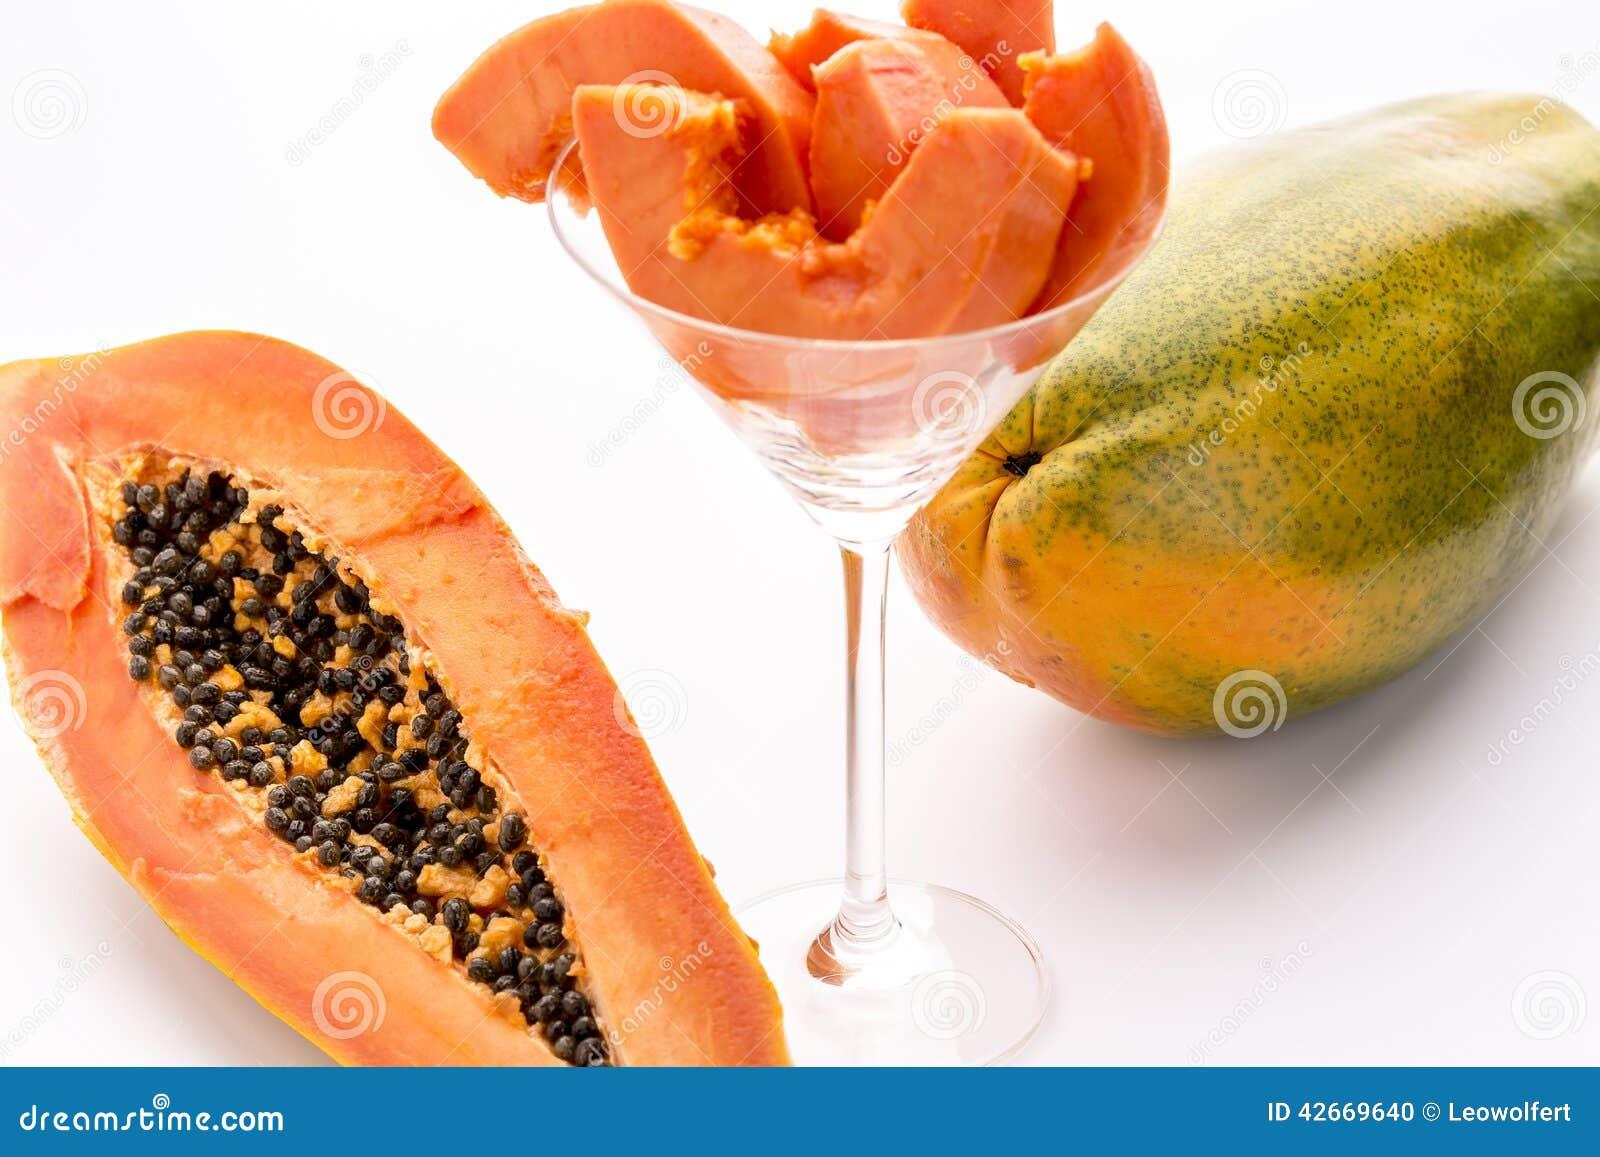 how to cut red papaya